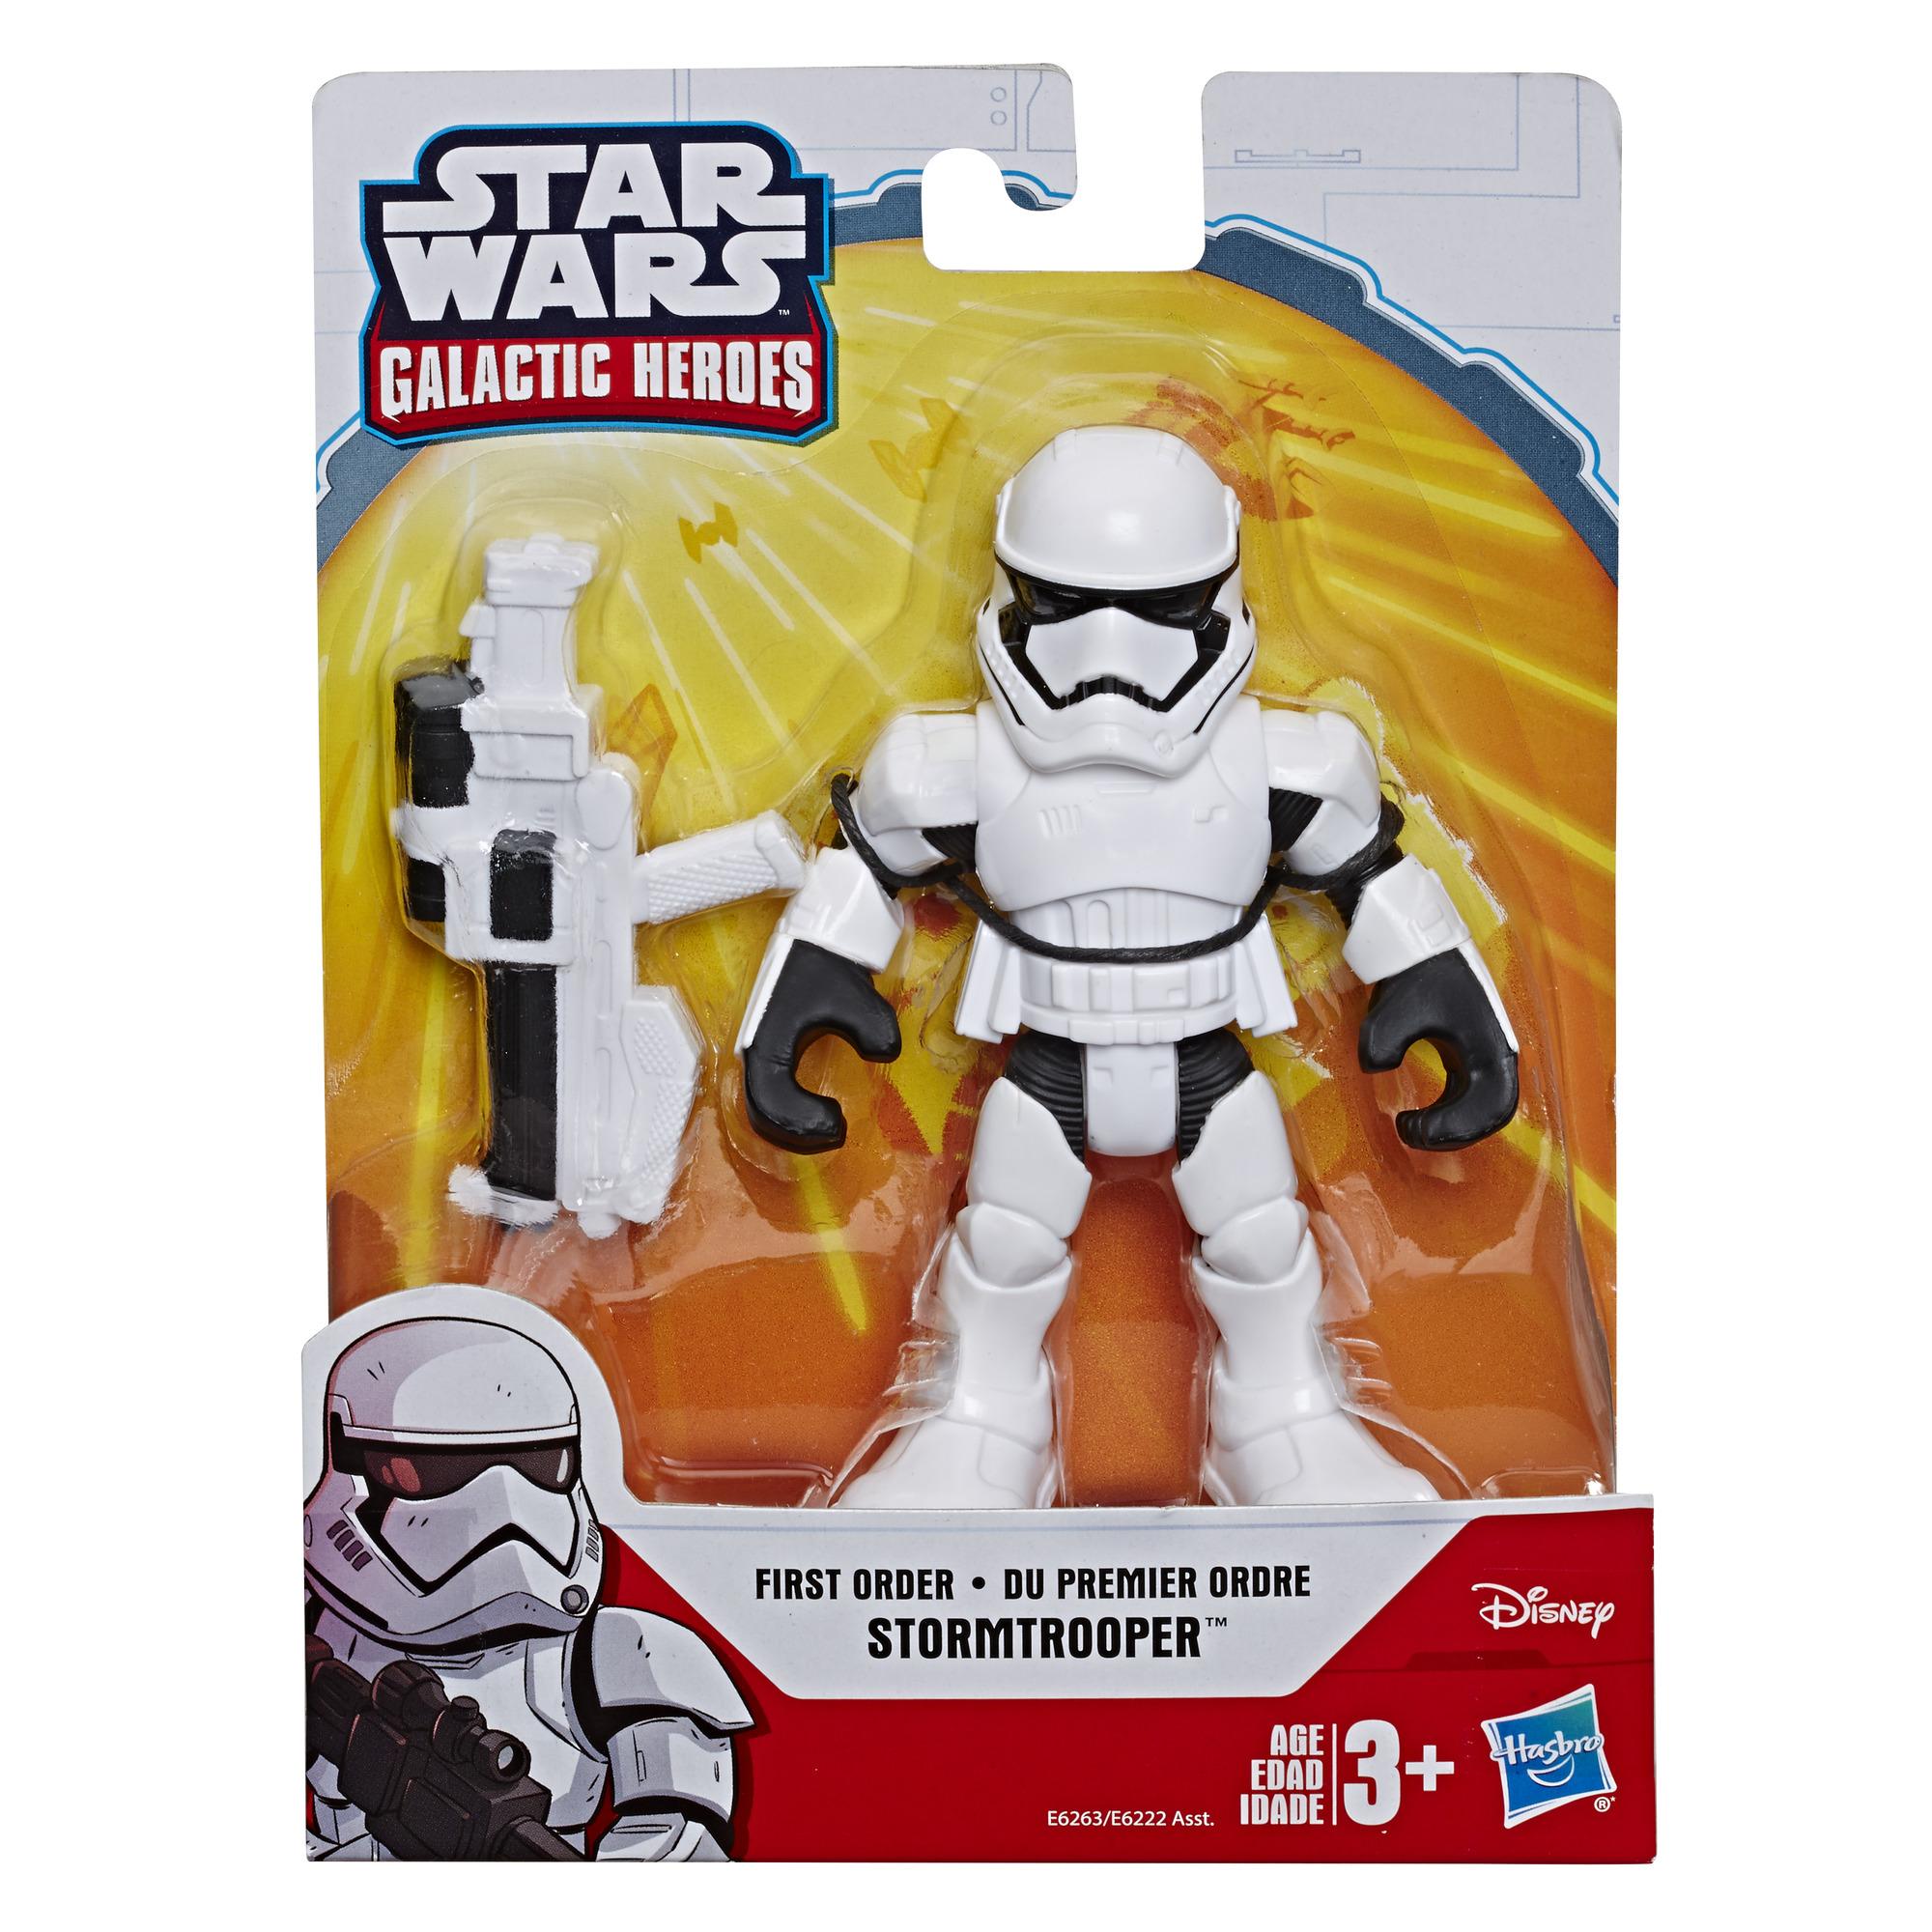 TRO GH FO Stormtrooper Mega figure 1